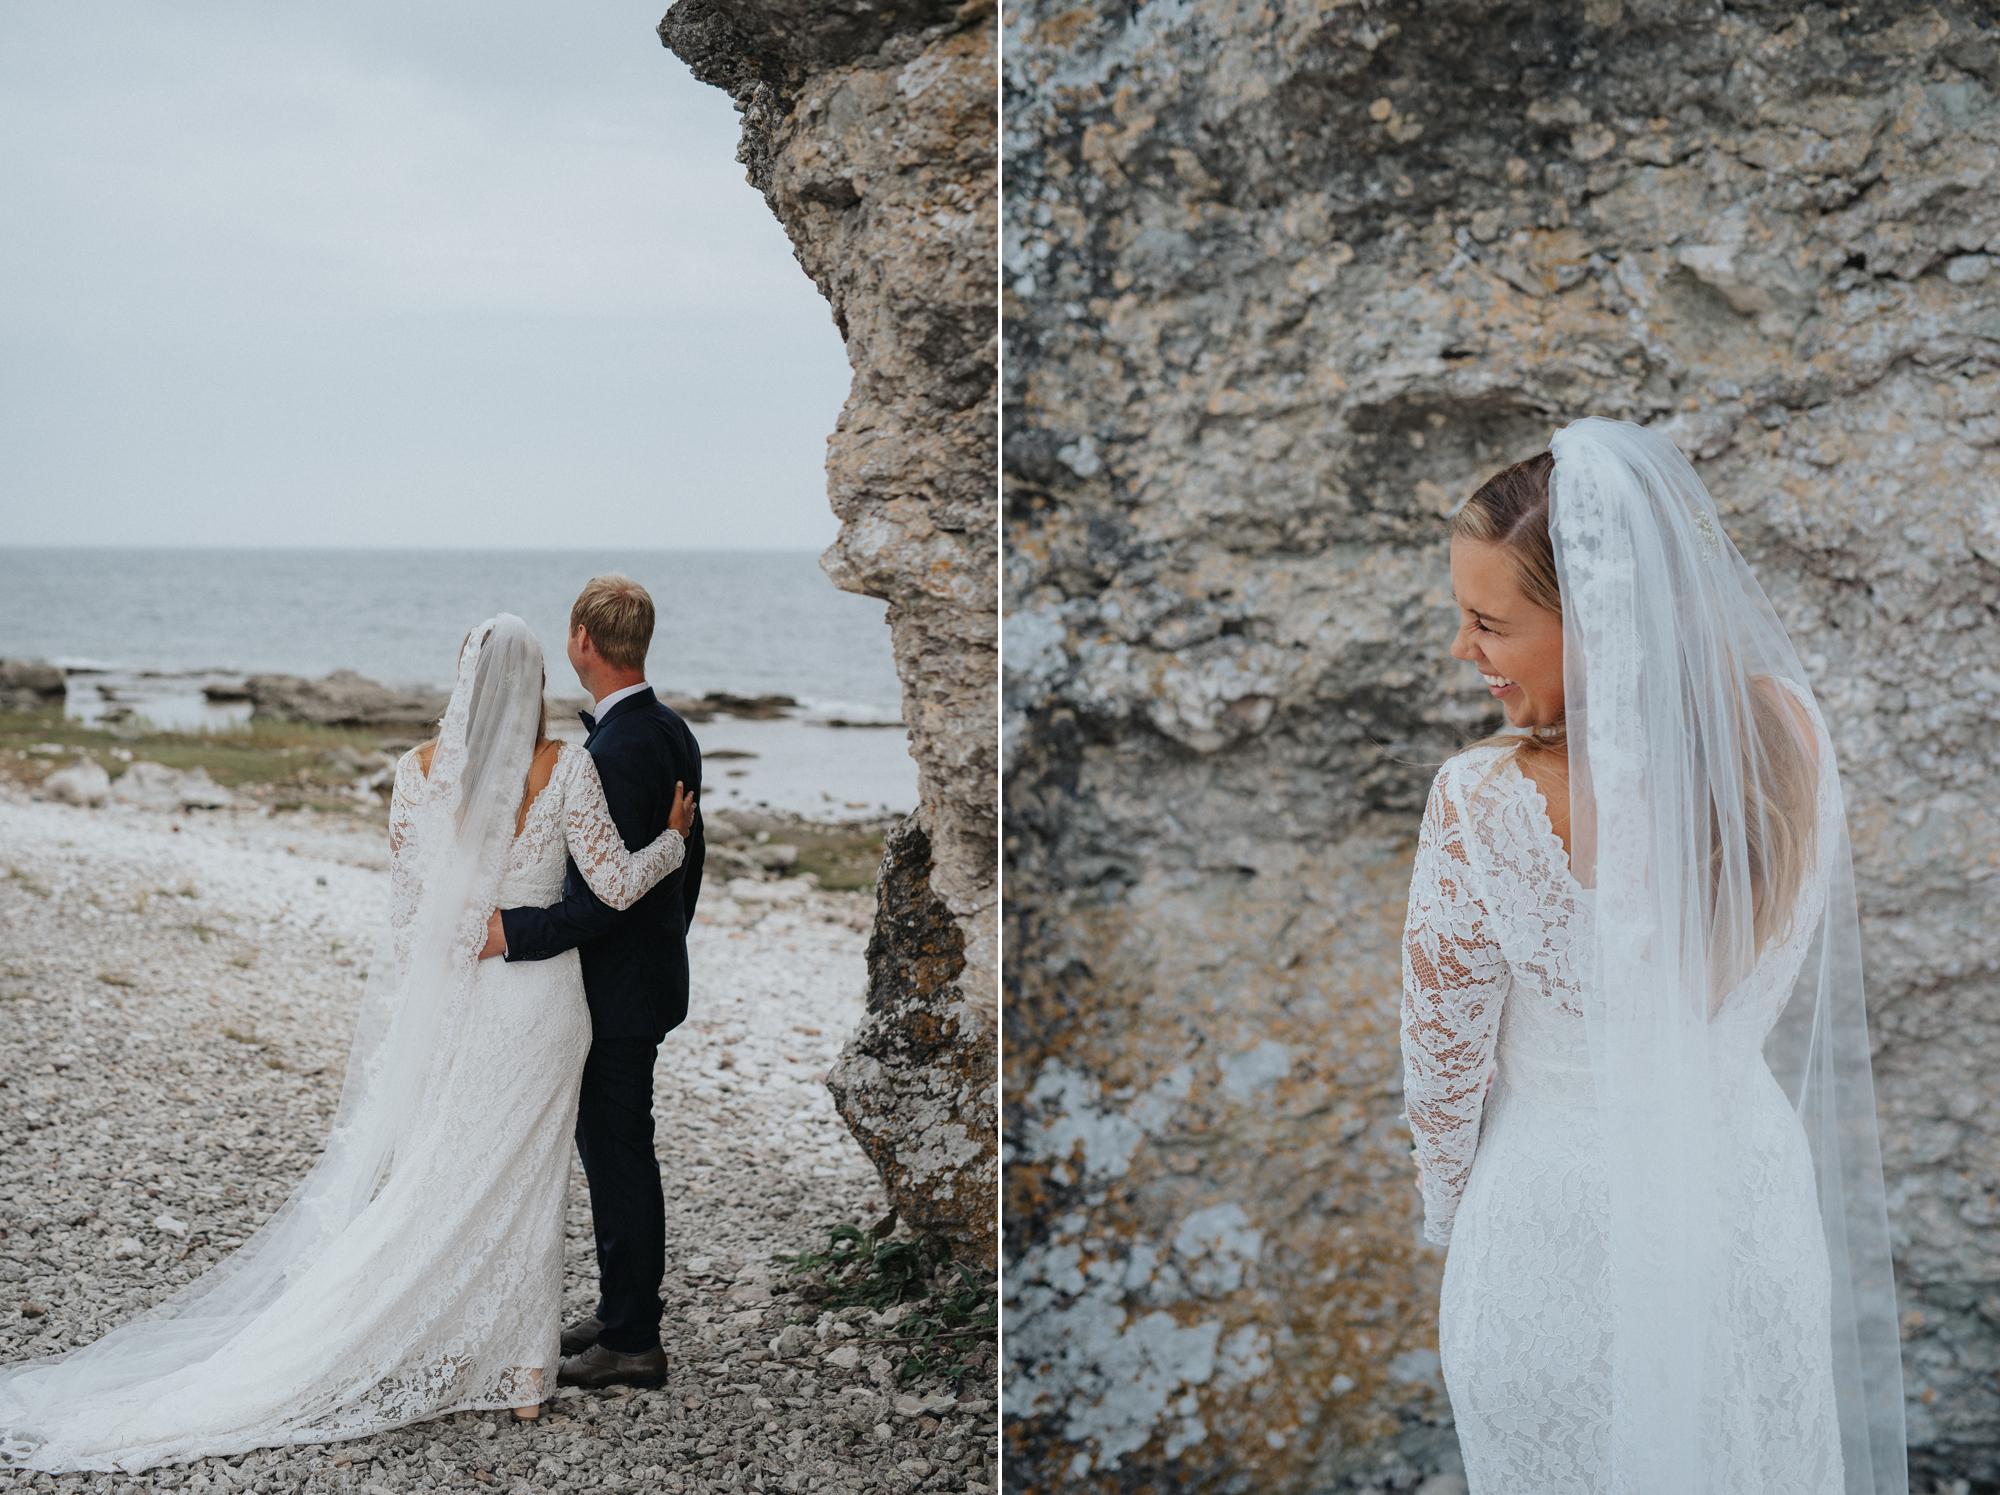 021-bröllopsfotograf-folhammar-gotland-neas-fotografi.jpg